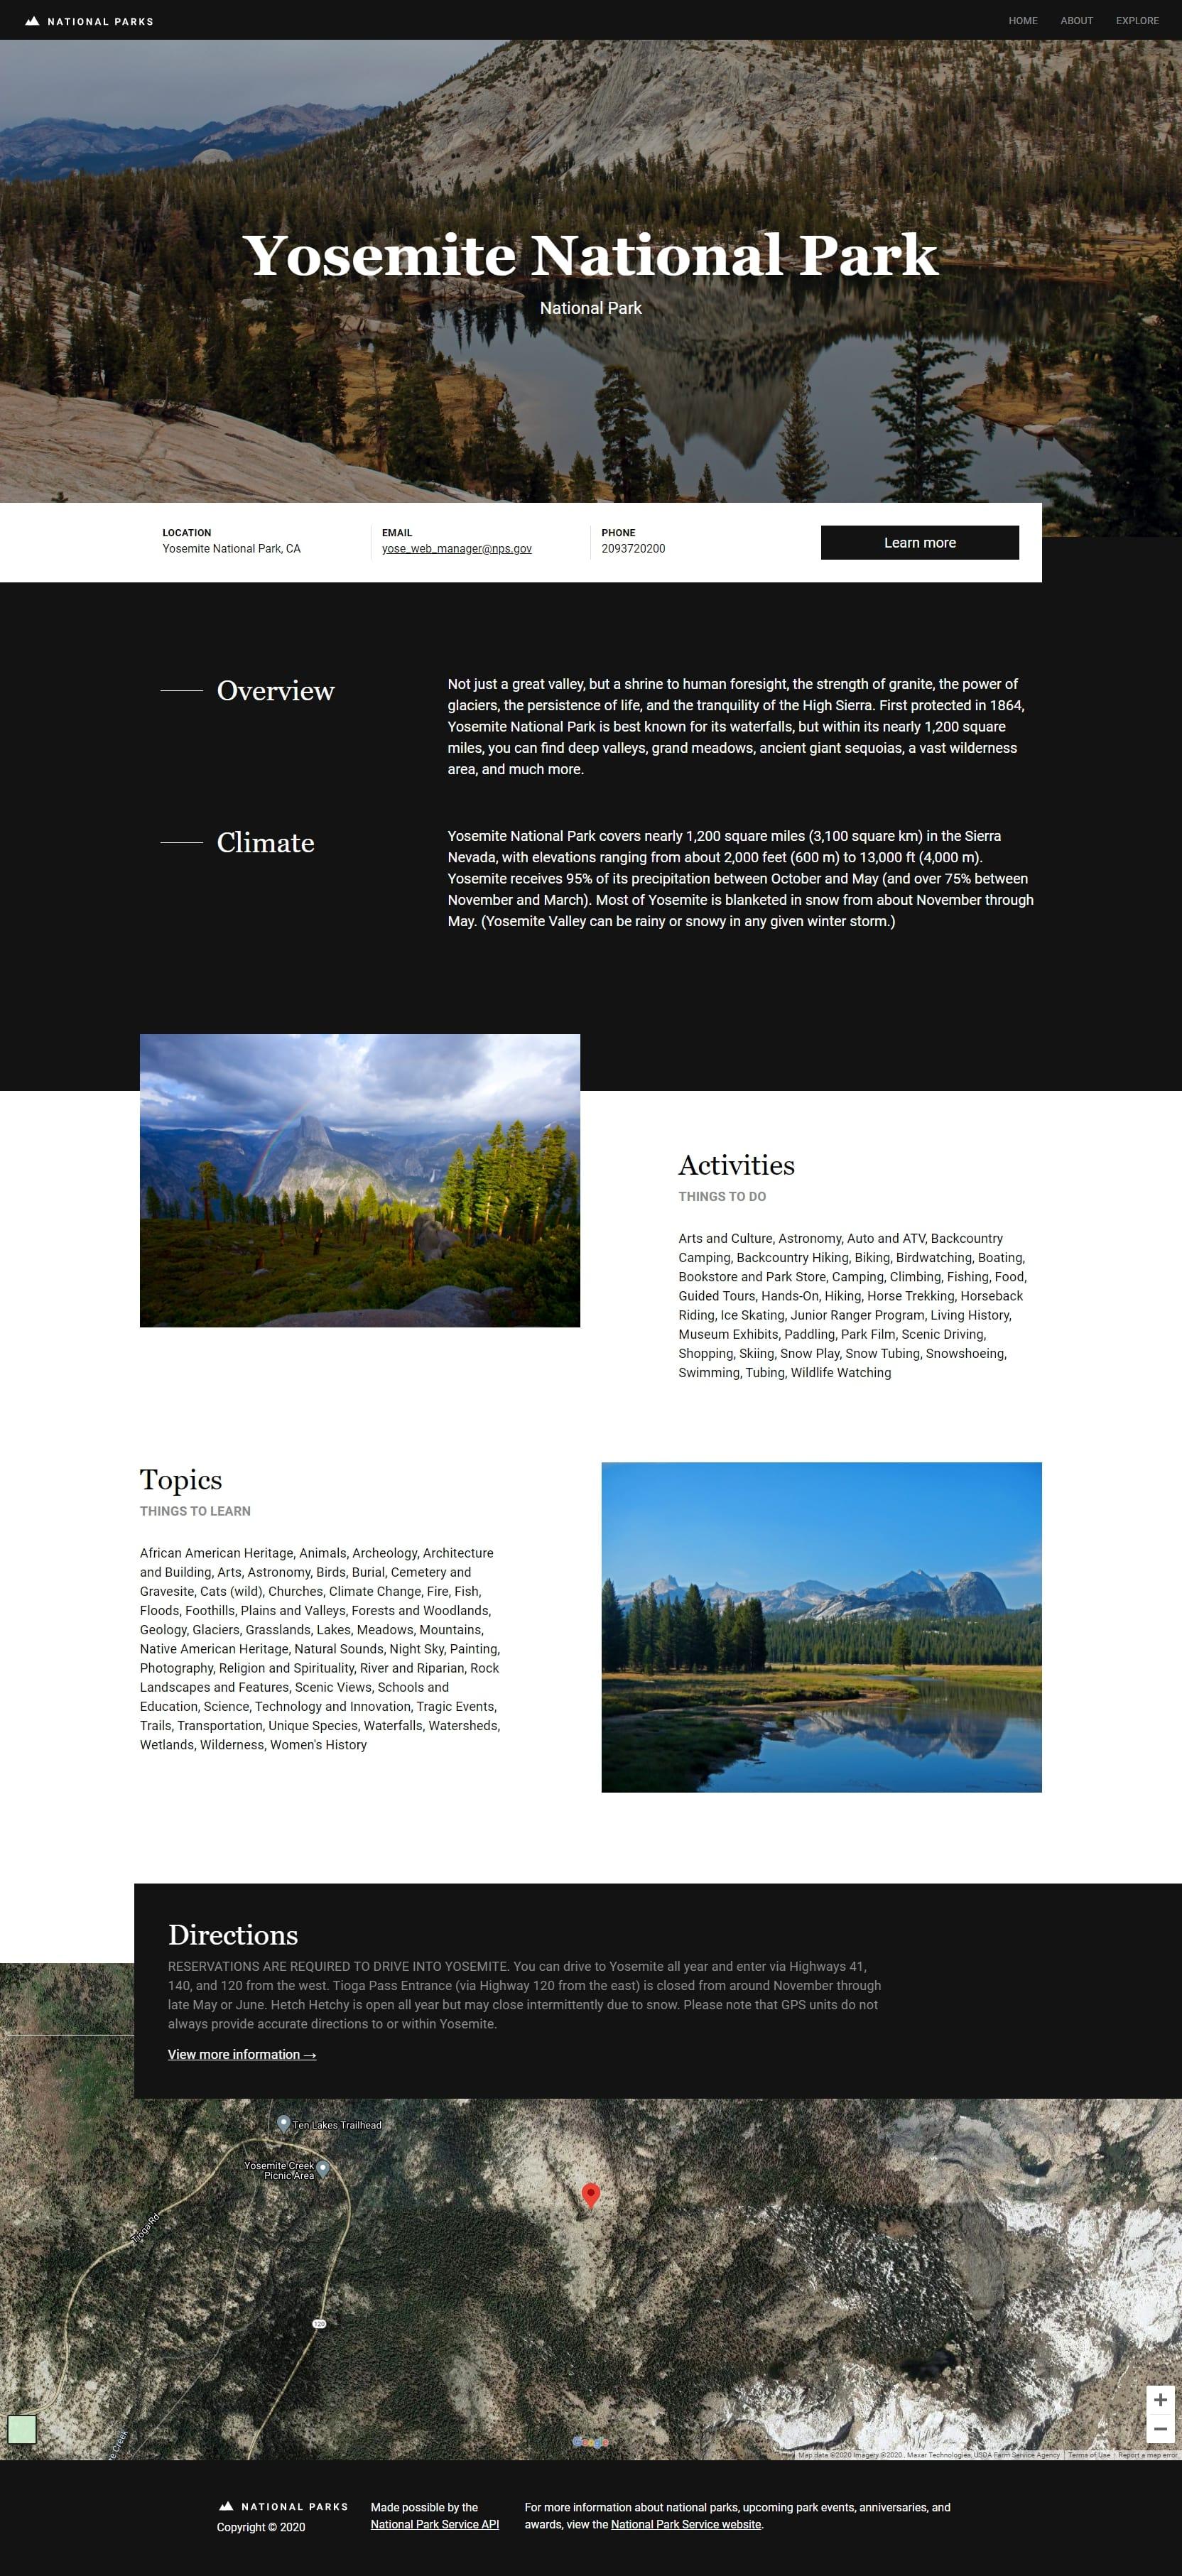 National Parks - Yosemite